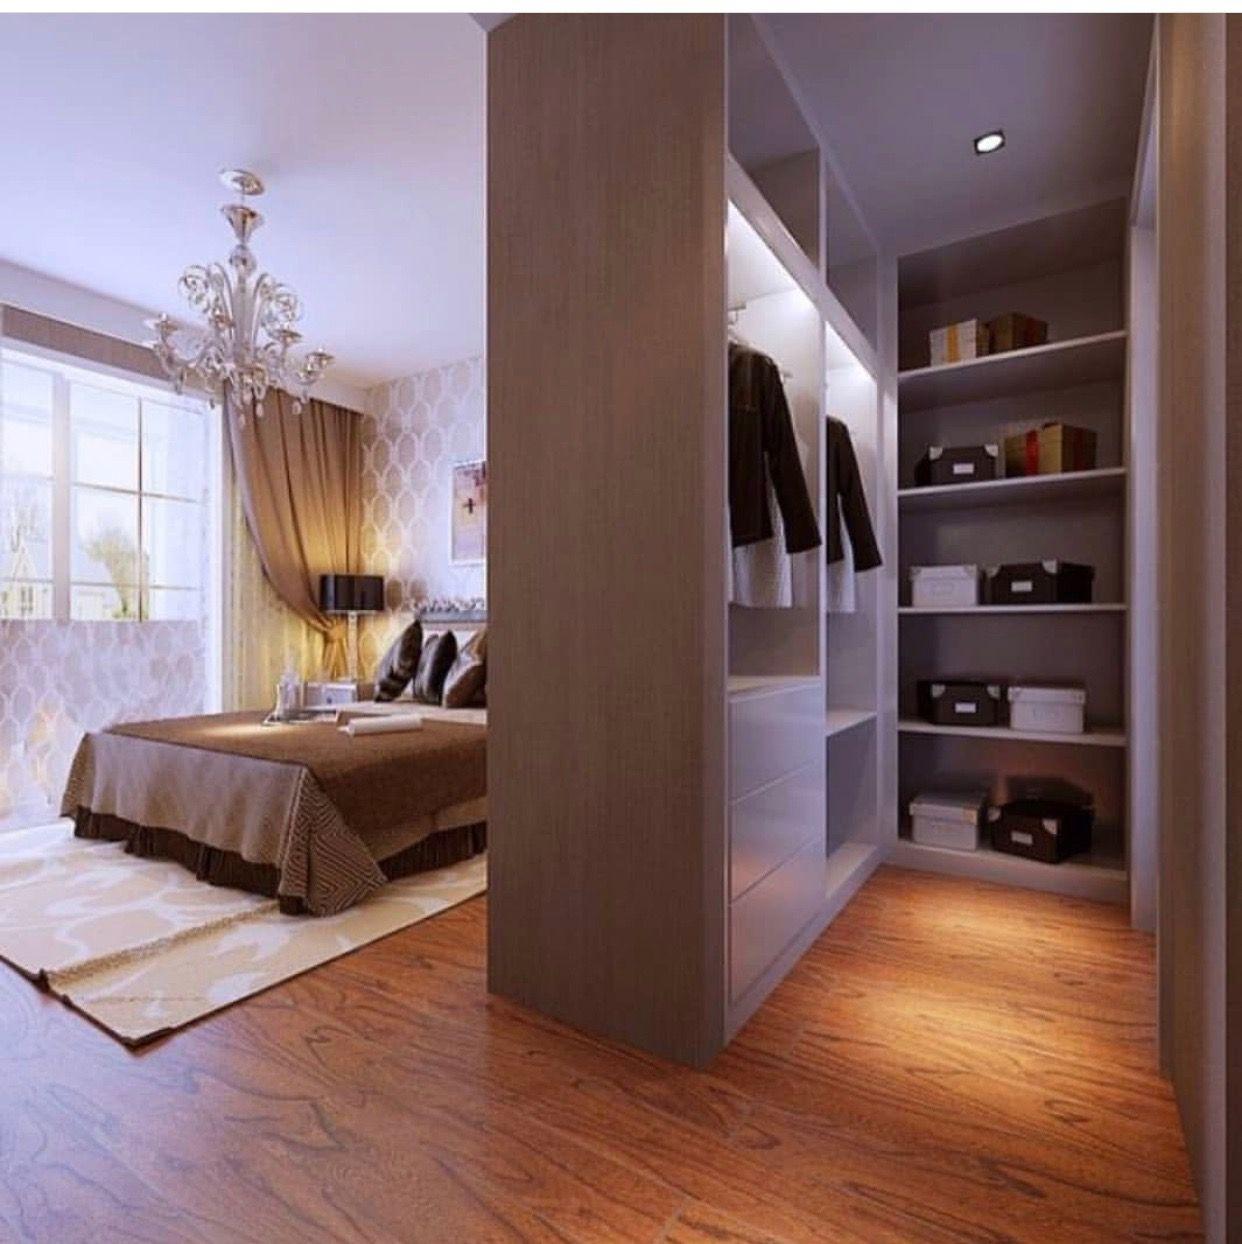 Pin By Jana On Decoracao Closet Bedroom Bedroom Closet Design Bedroom Design